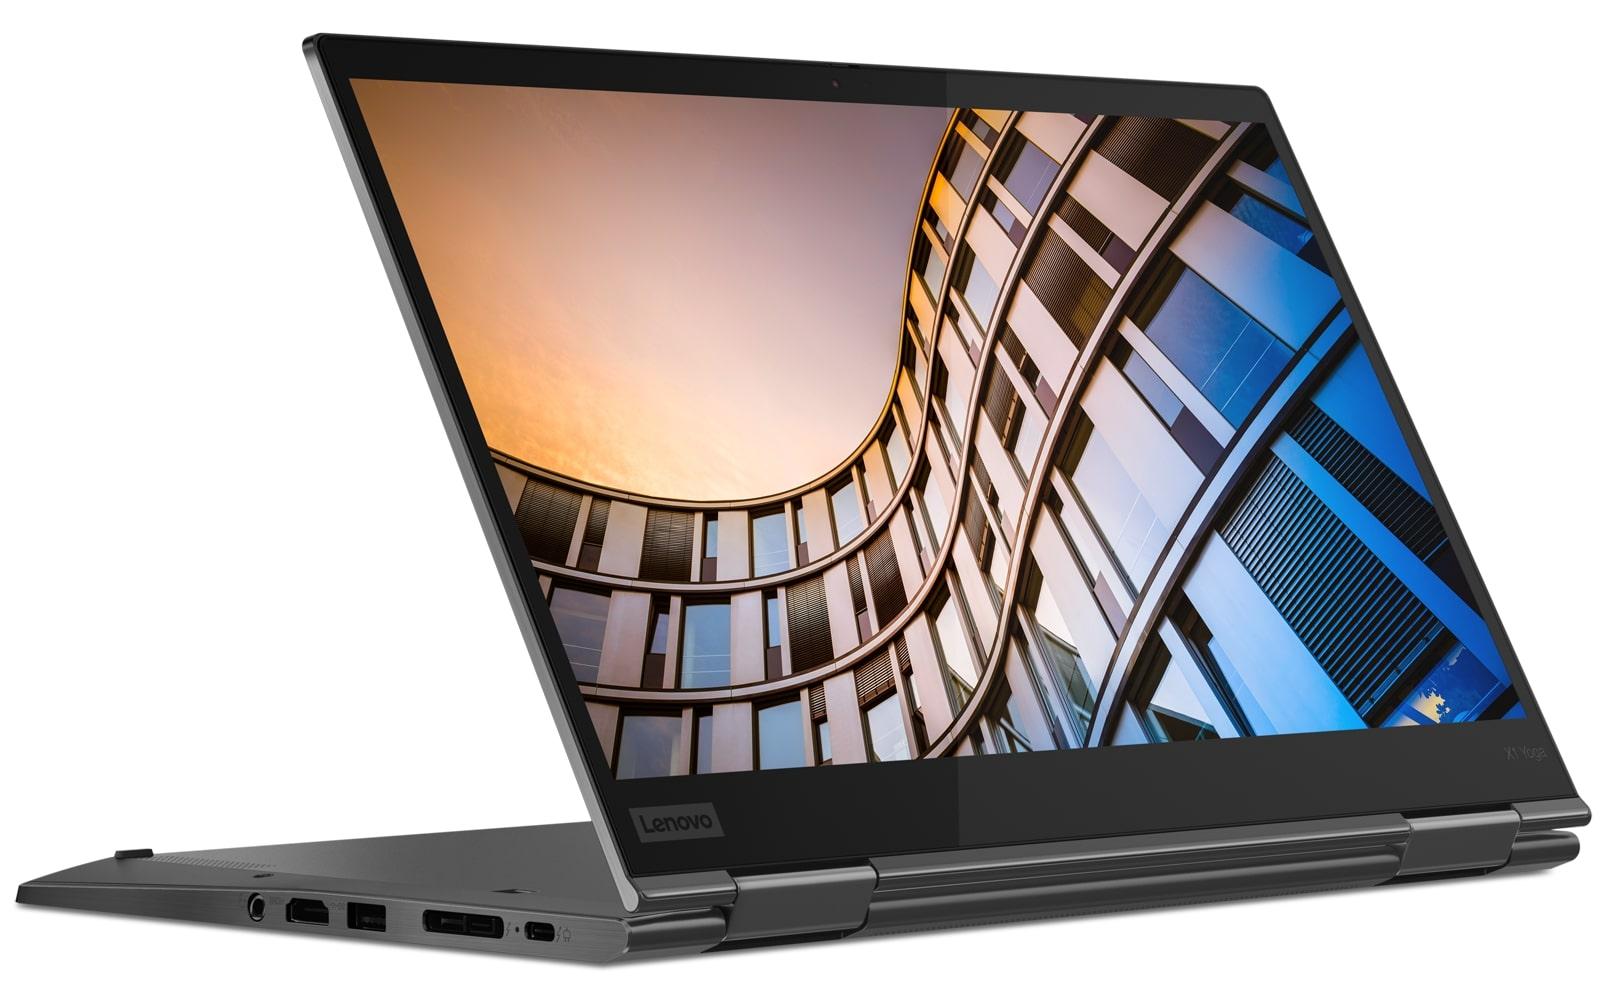 TP X1 Yoga 4 14FHD/i7-8565U/16G/512/LTE/W10P